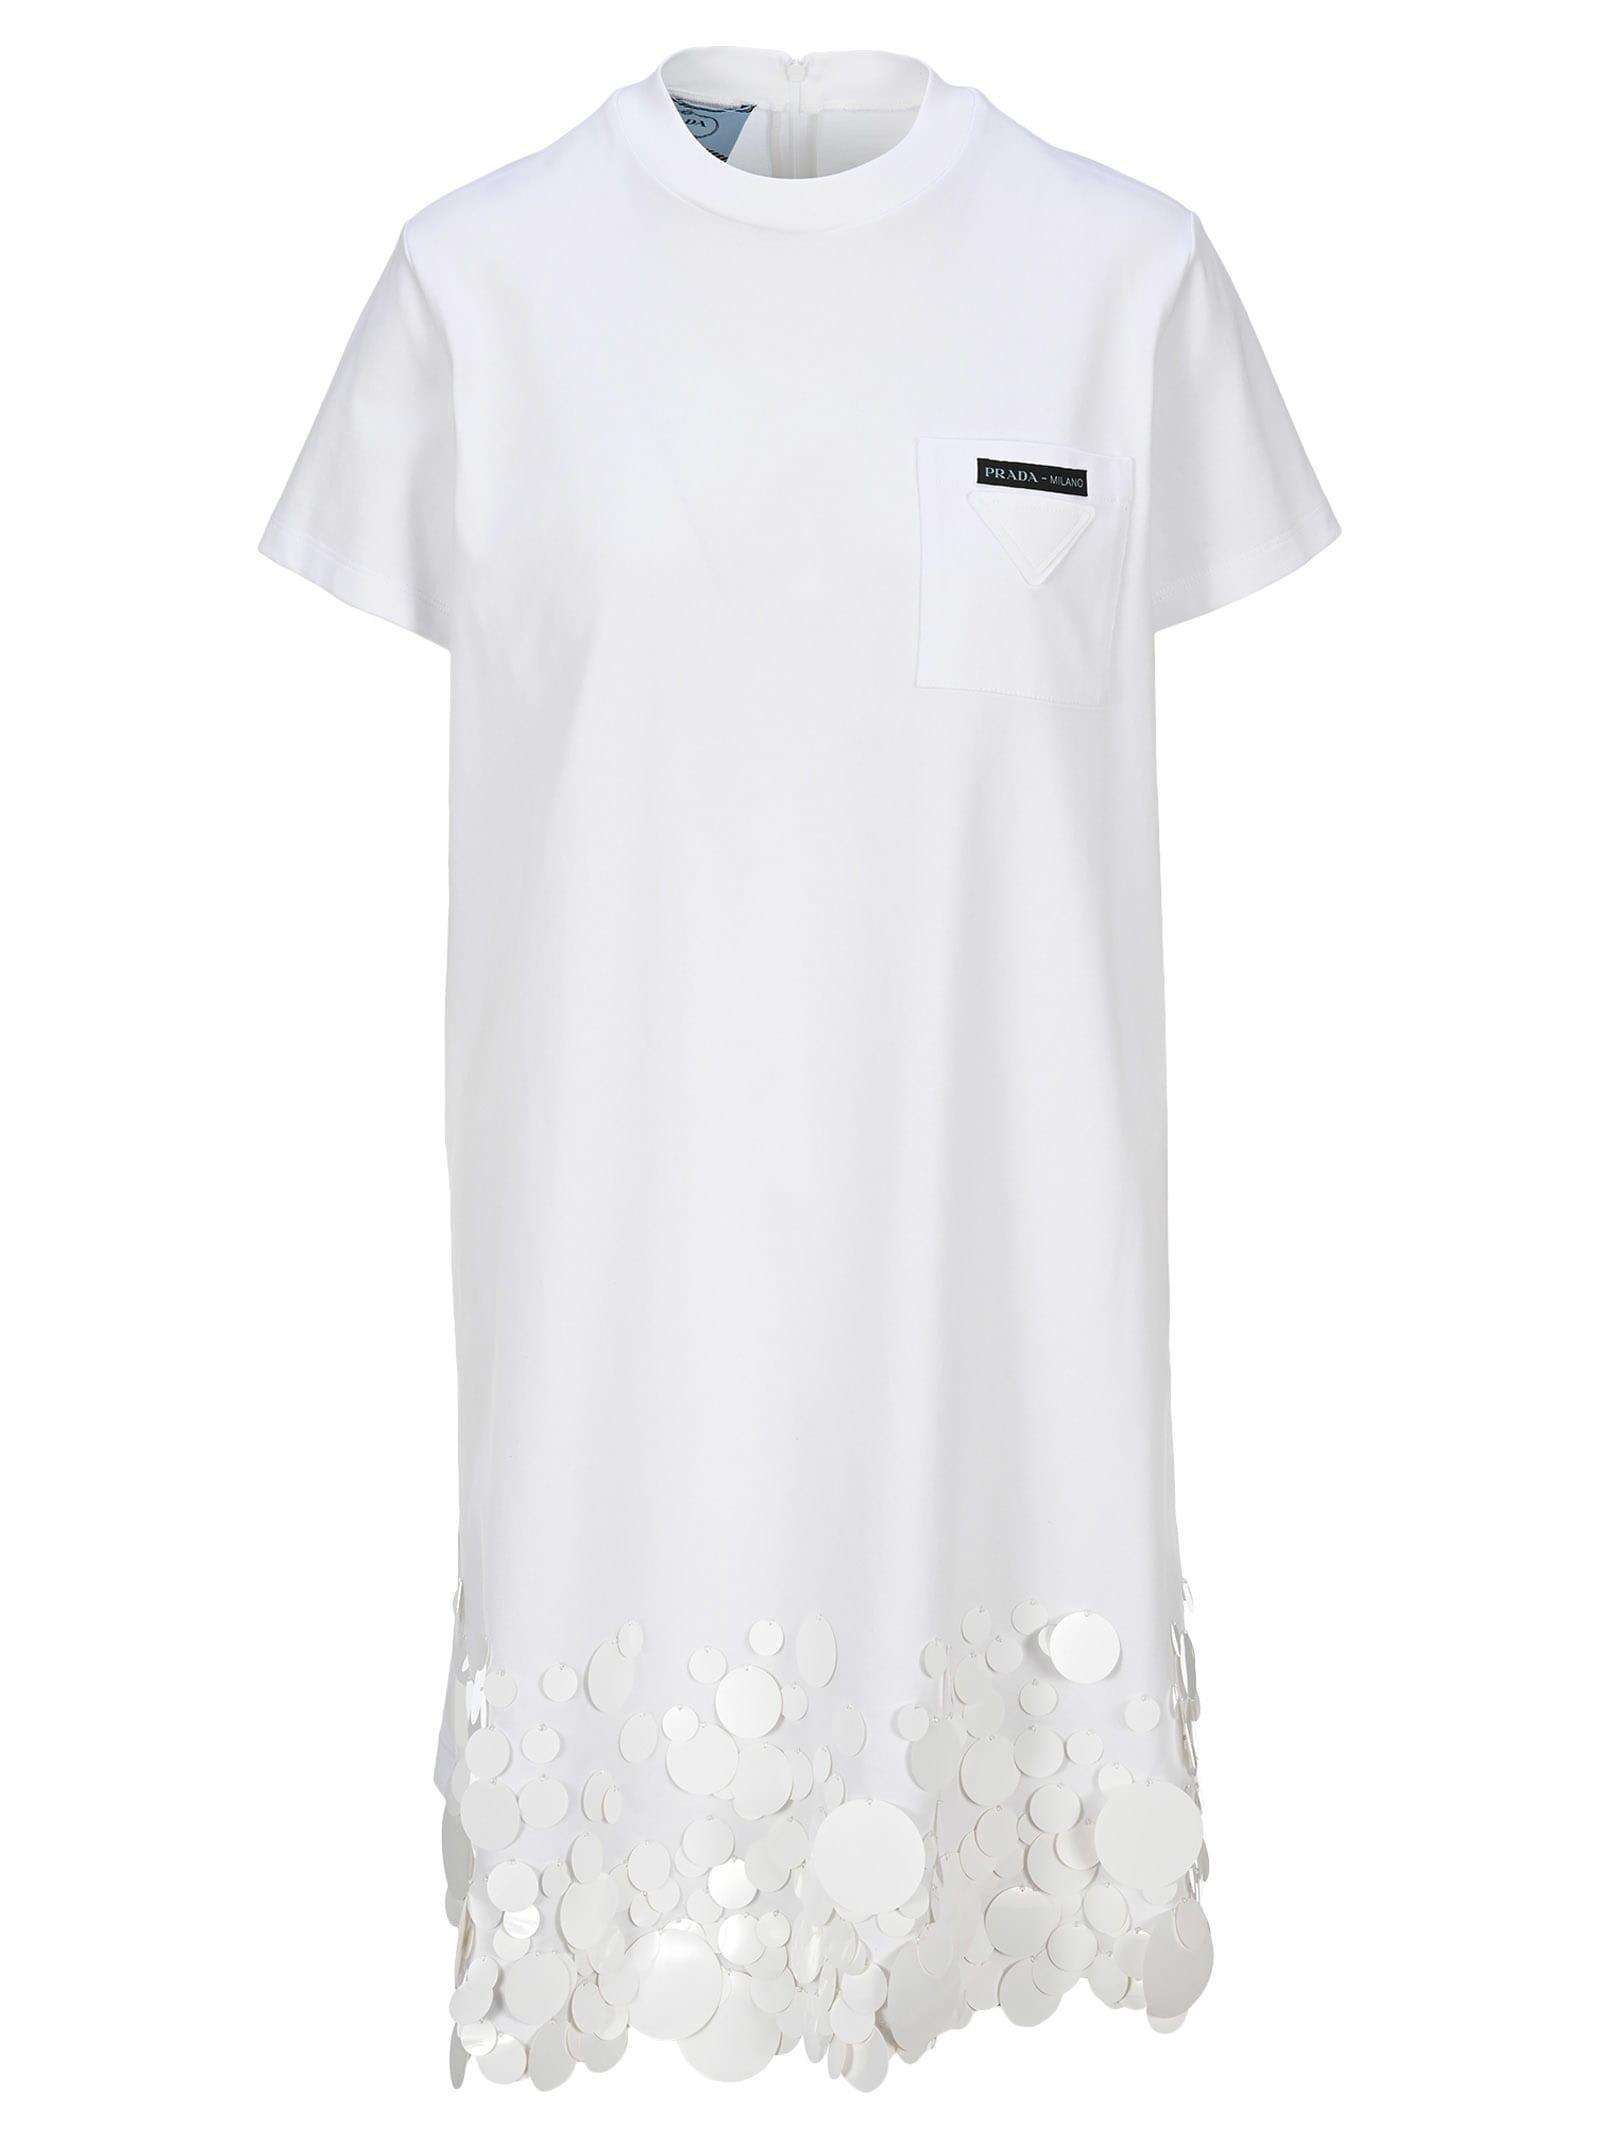 Buy Prada Embellished T-shirt Dress online, shop Prada with free shipping